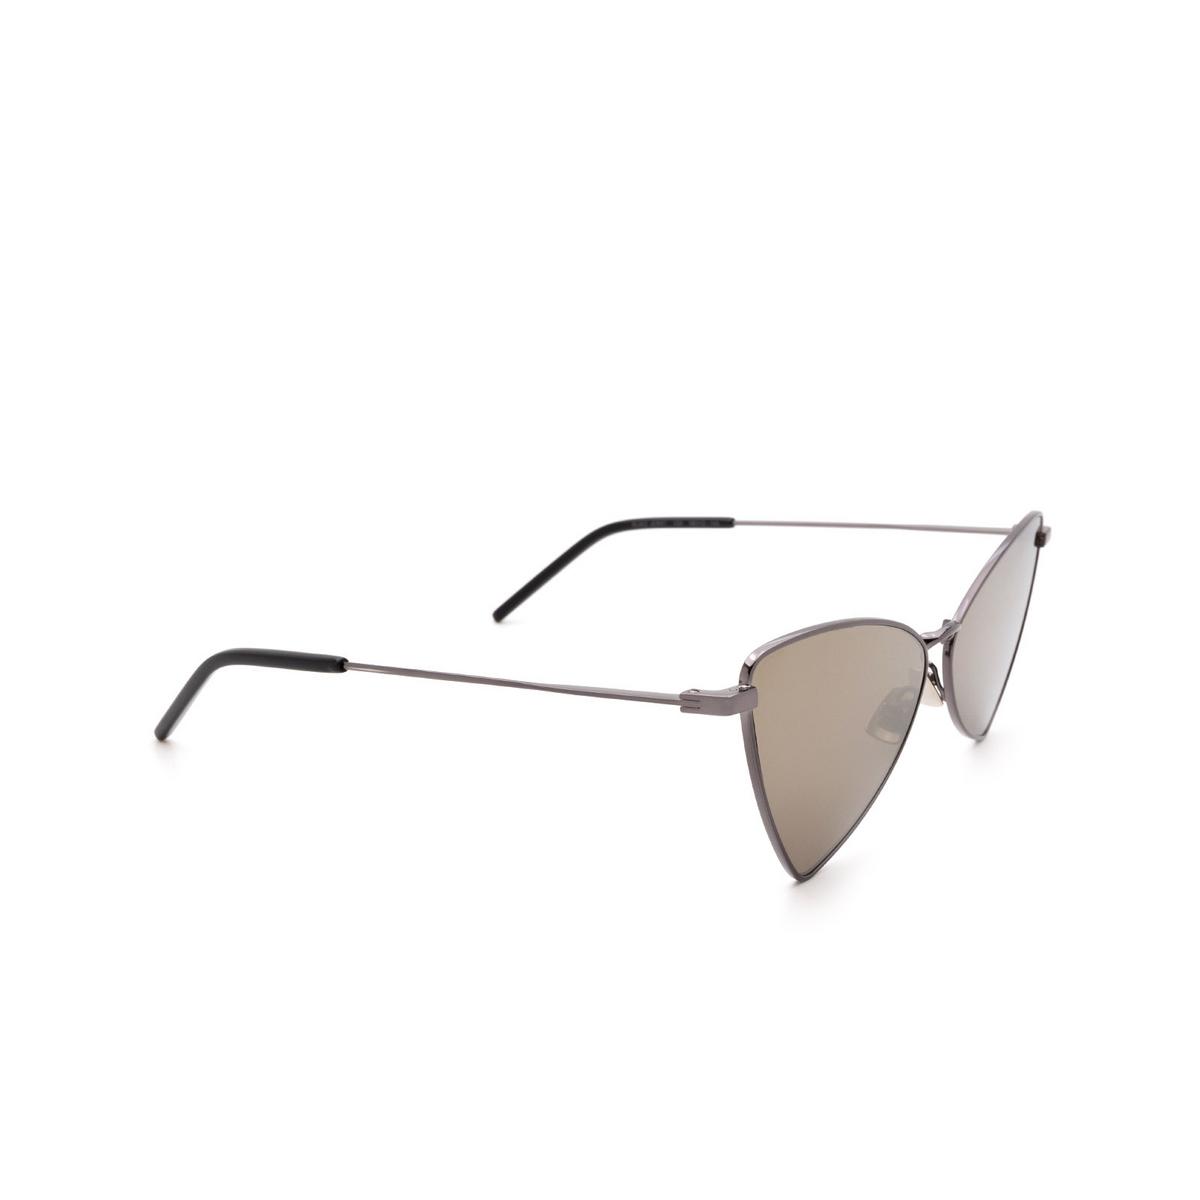 Saint Laurent® Irregular Sunglasses: Jerry SL 303 color Ruthenium 008 - three-quarters view.